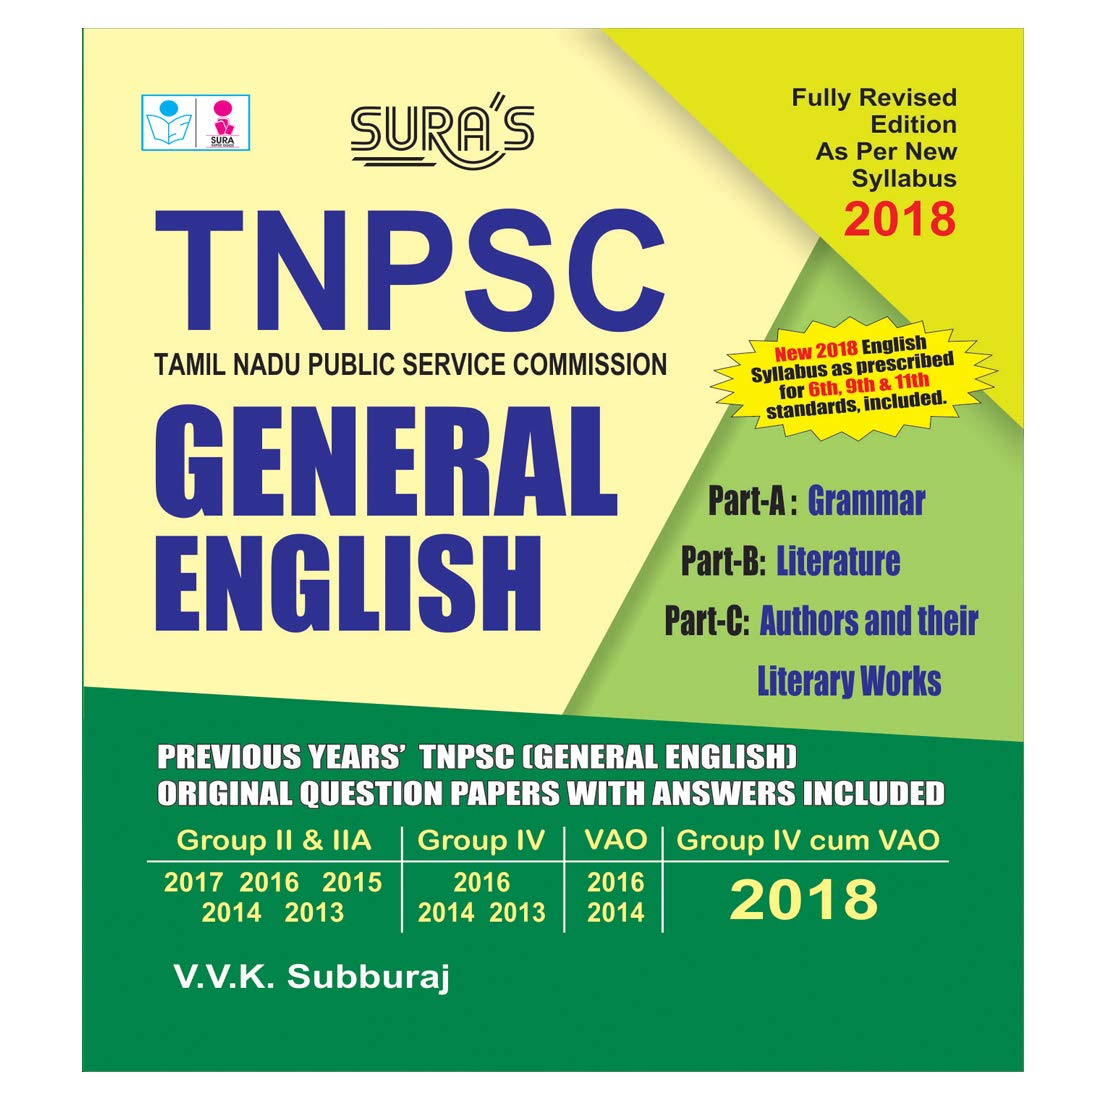 Sura Tnpsc Books Pdf